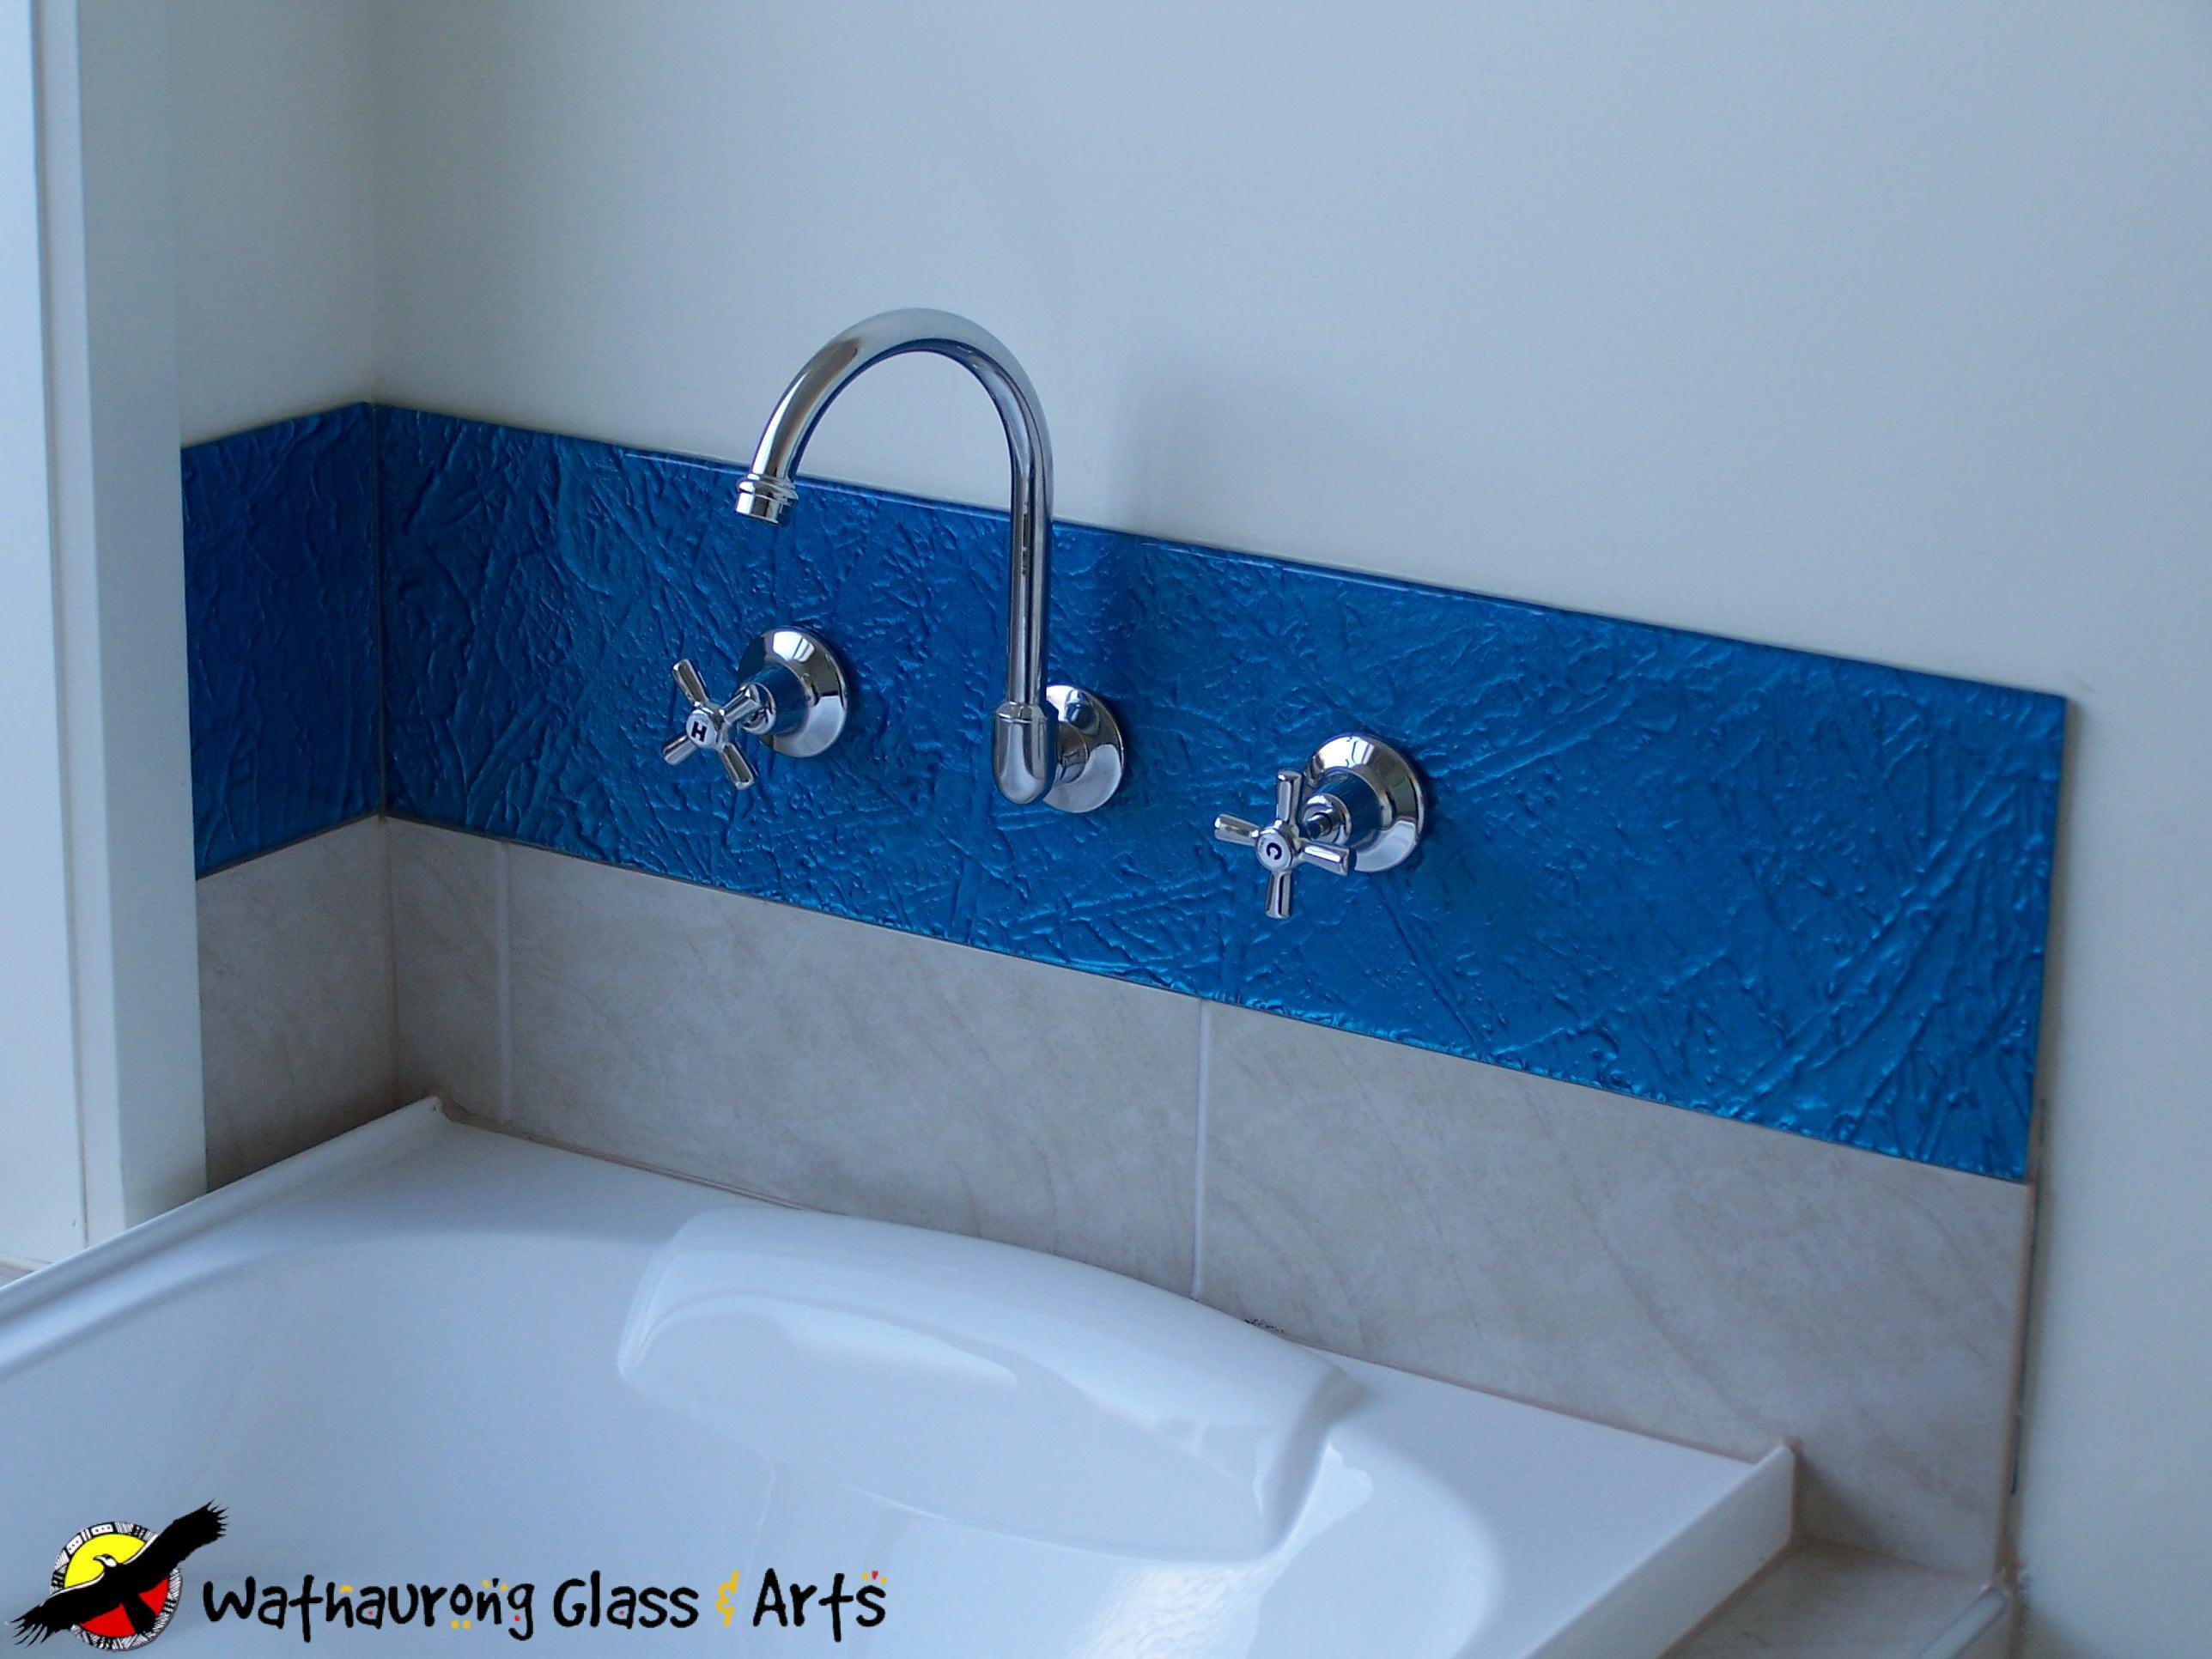 Blue Shower Splashback - Wathaurong Glass